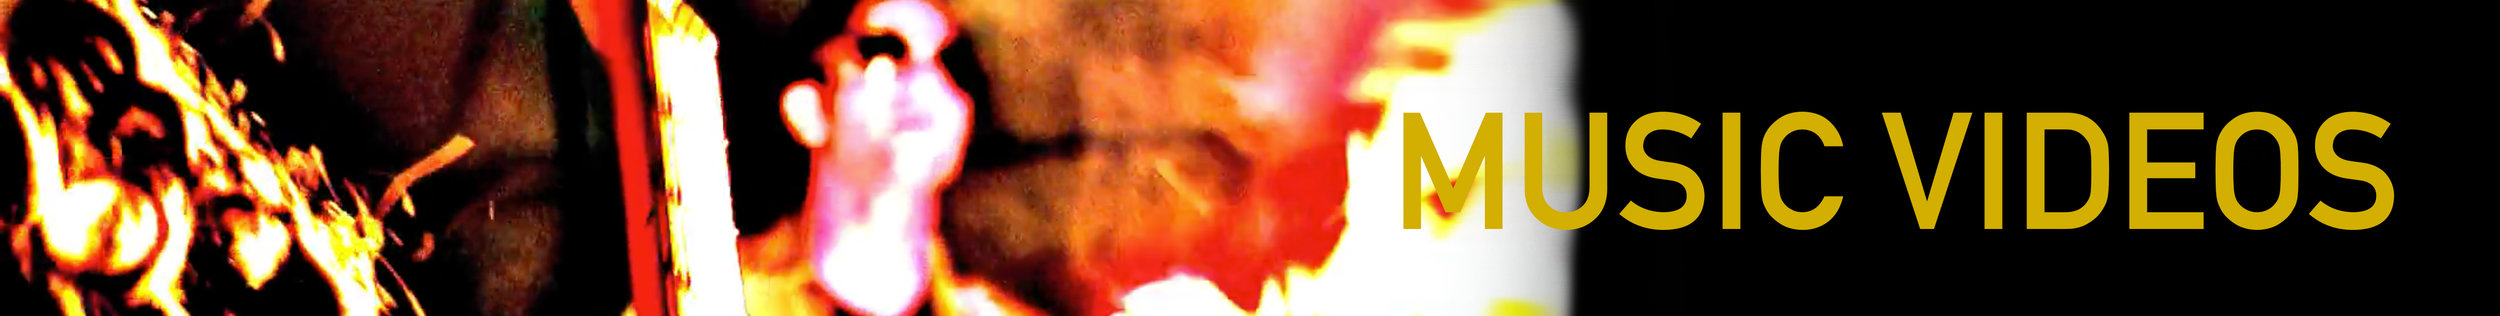 Website_Music Videos_02.jpg